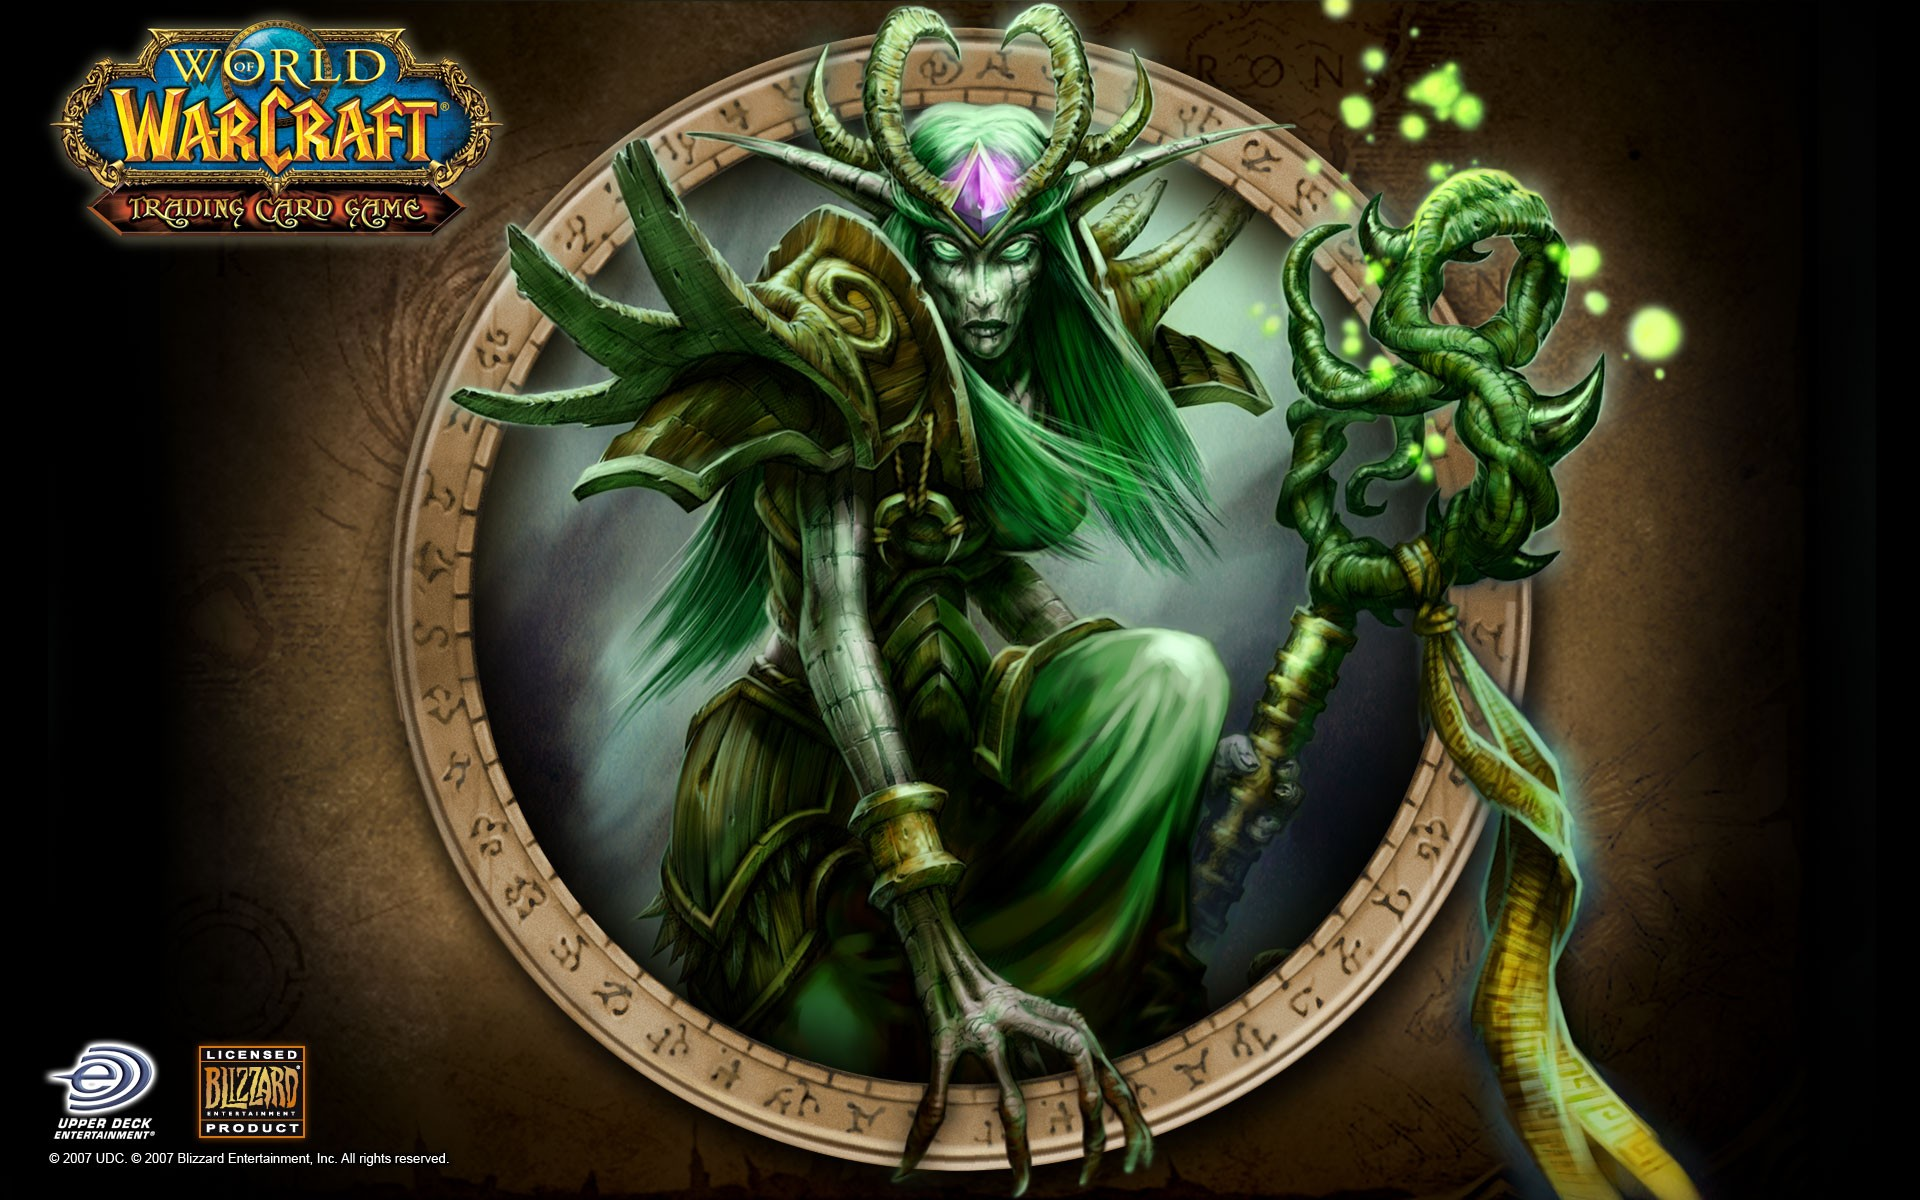 Dark Souls Animated Wallpaper World Of Warcraft Legion Wallpaper 183 ① Download Free